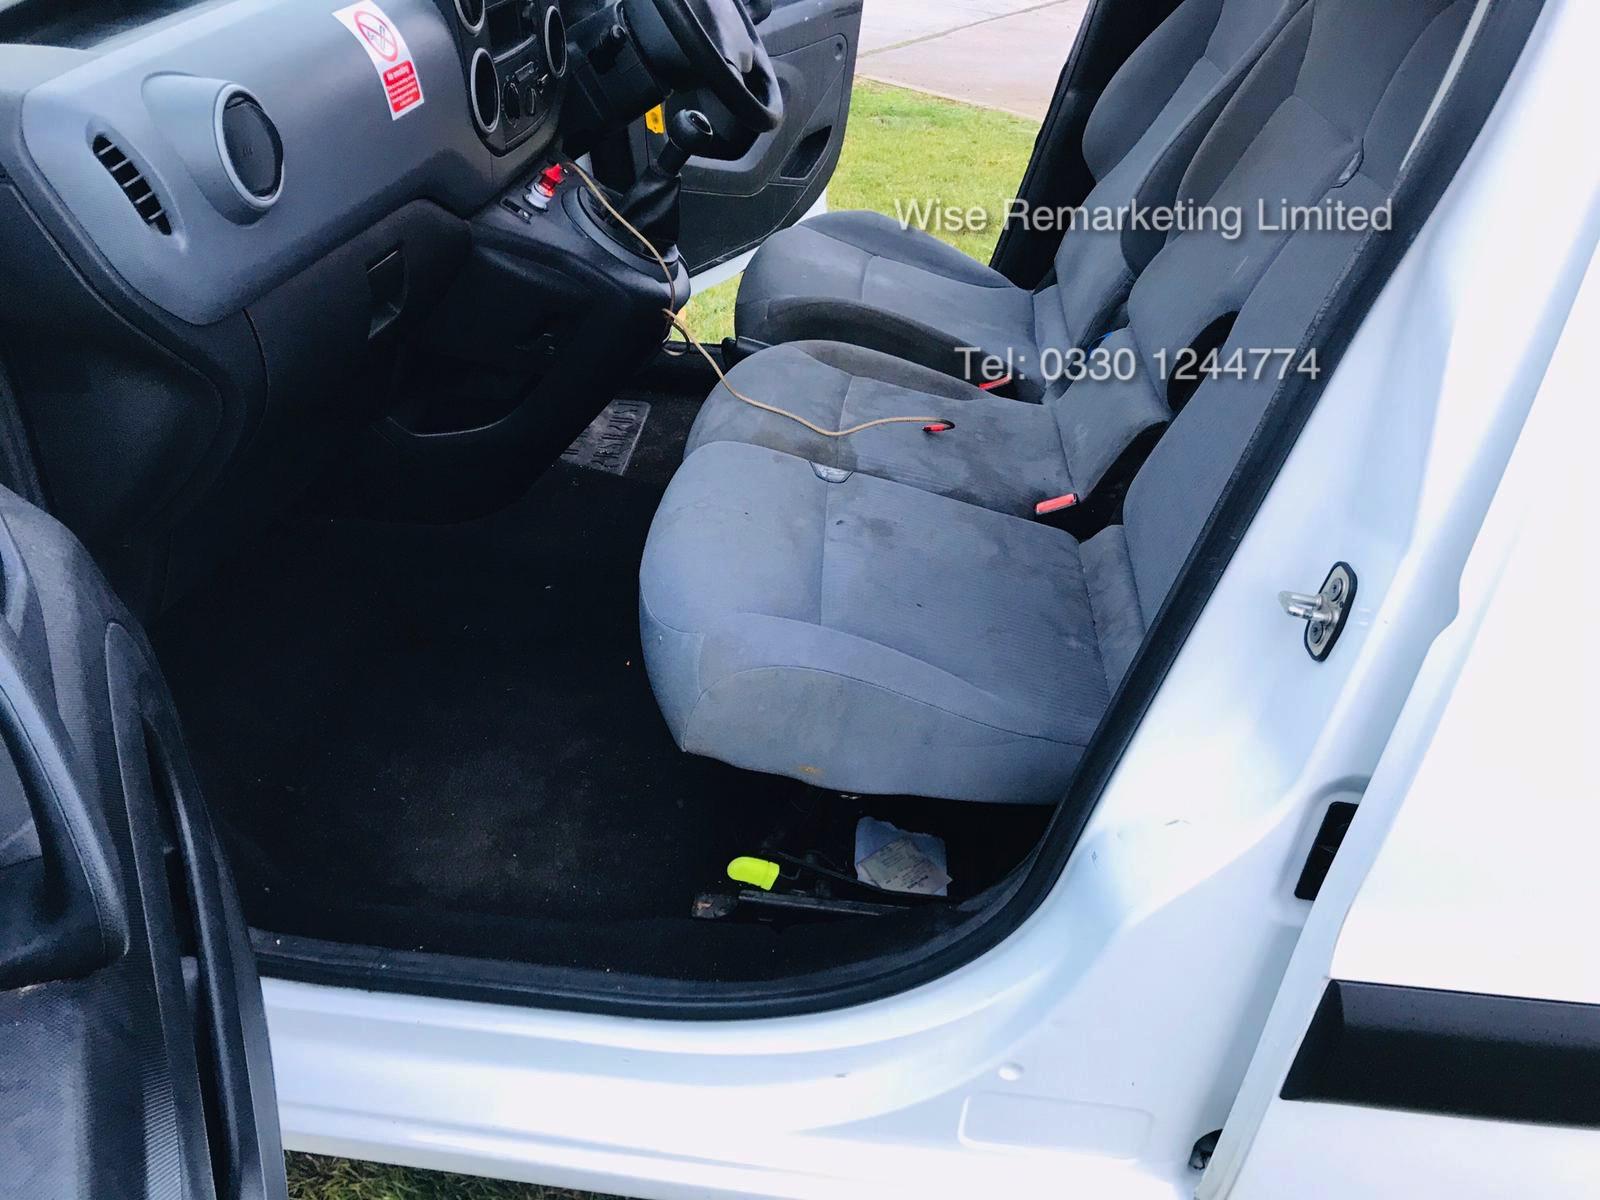 Lot 13 - Peugeot Partner 1.6 HDi Professional - 2015 15 Reg - 1 Keeper From New - SAVE 20% NO VAT